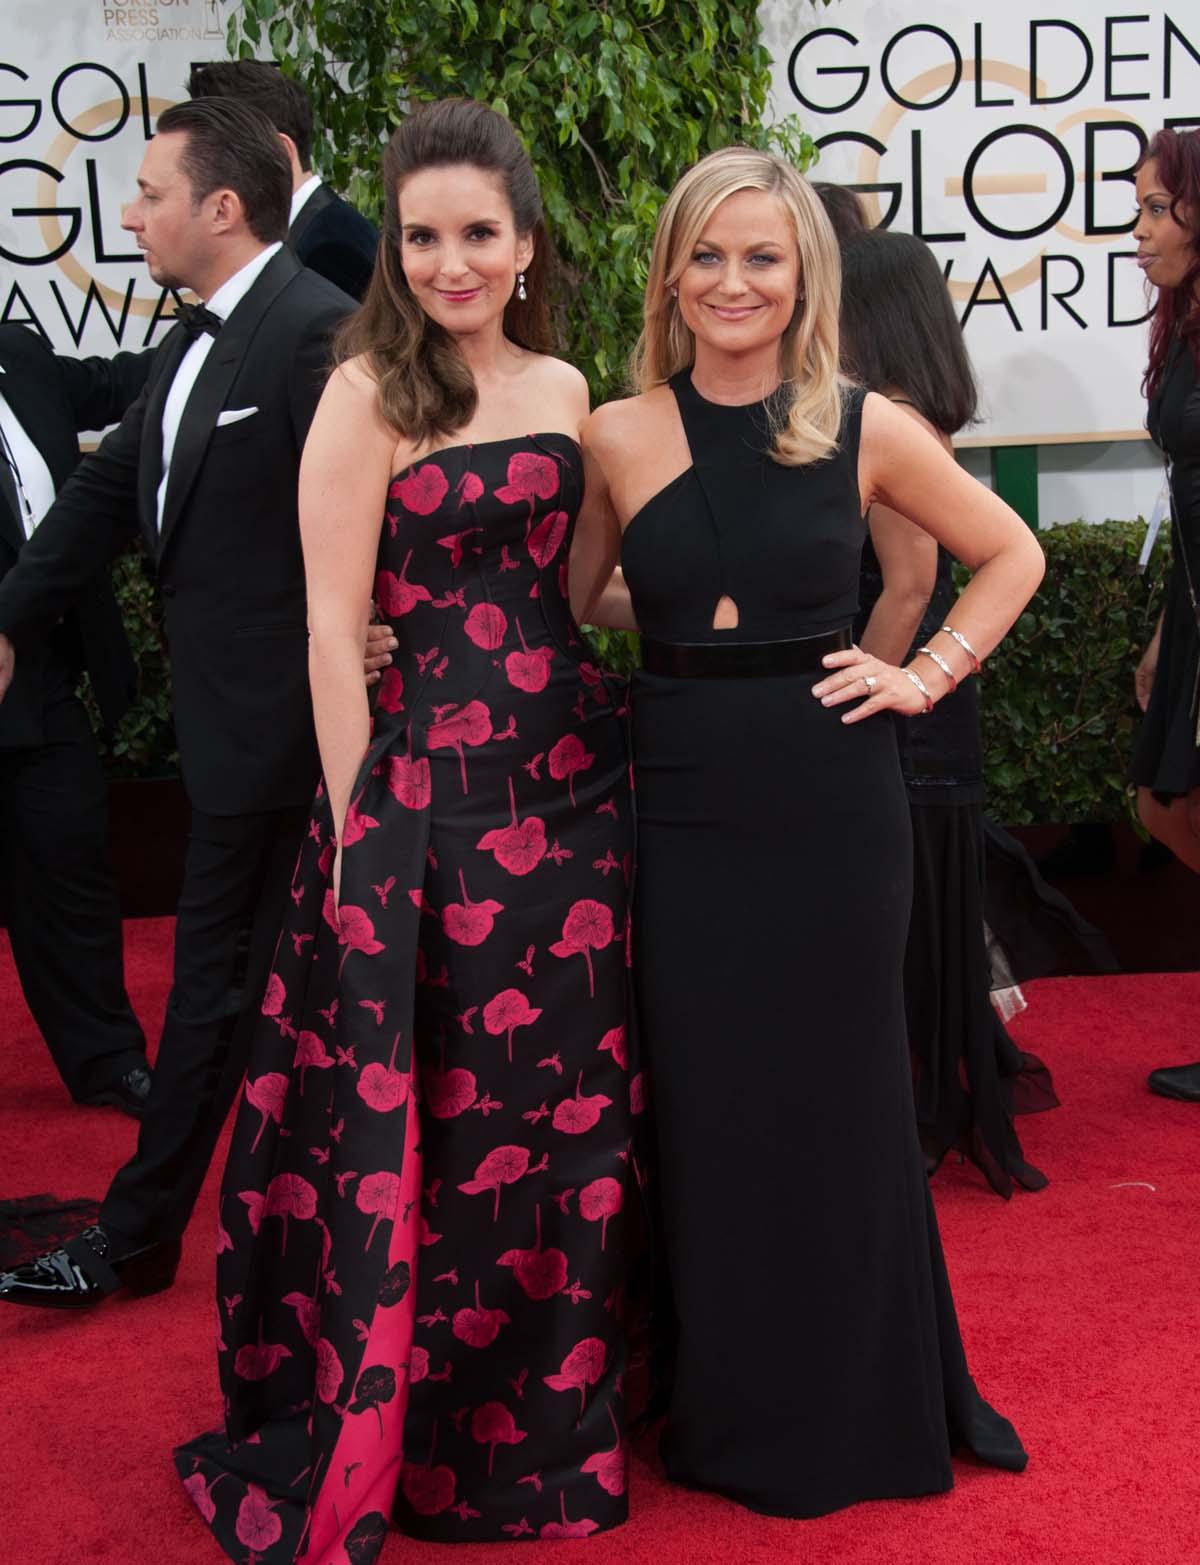 Tina Fey Amy Poehler Golden Globes Red Carpet